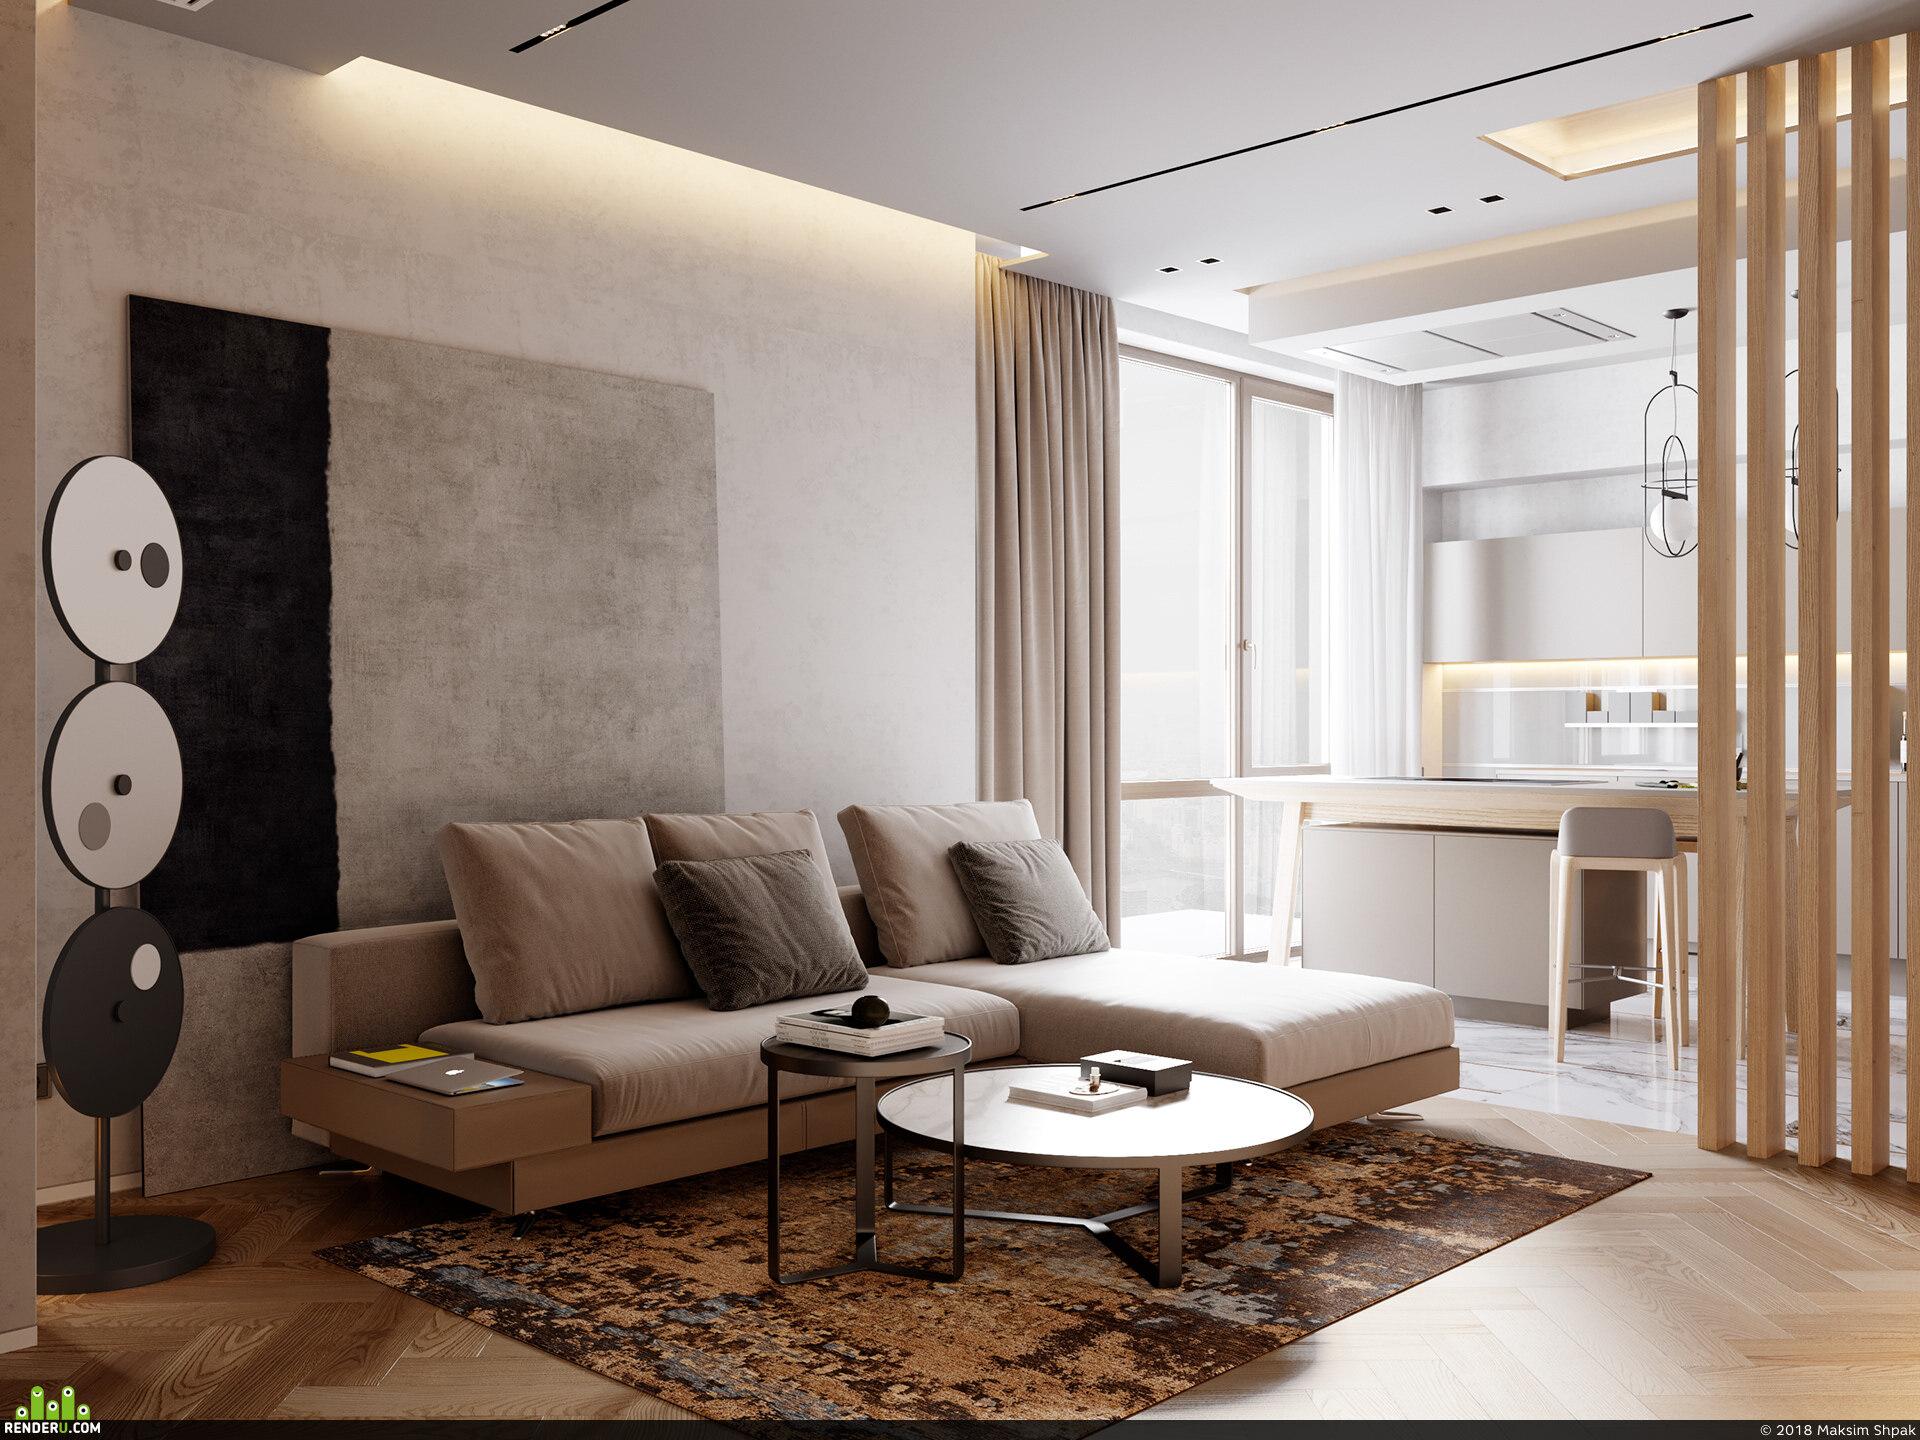 preview DE&DE/The First line apartment